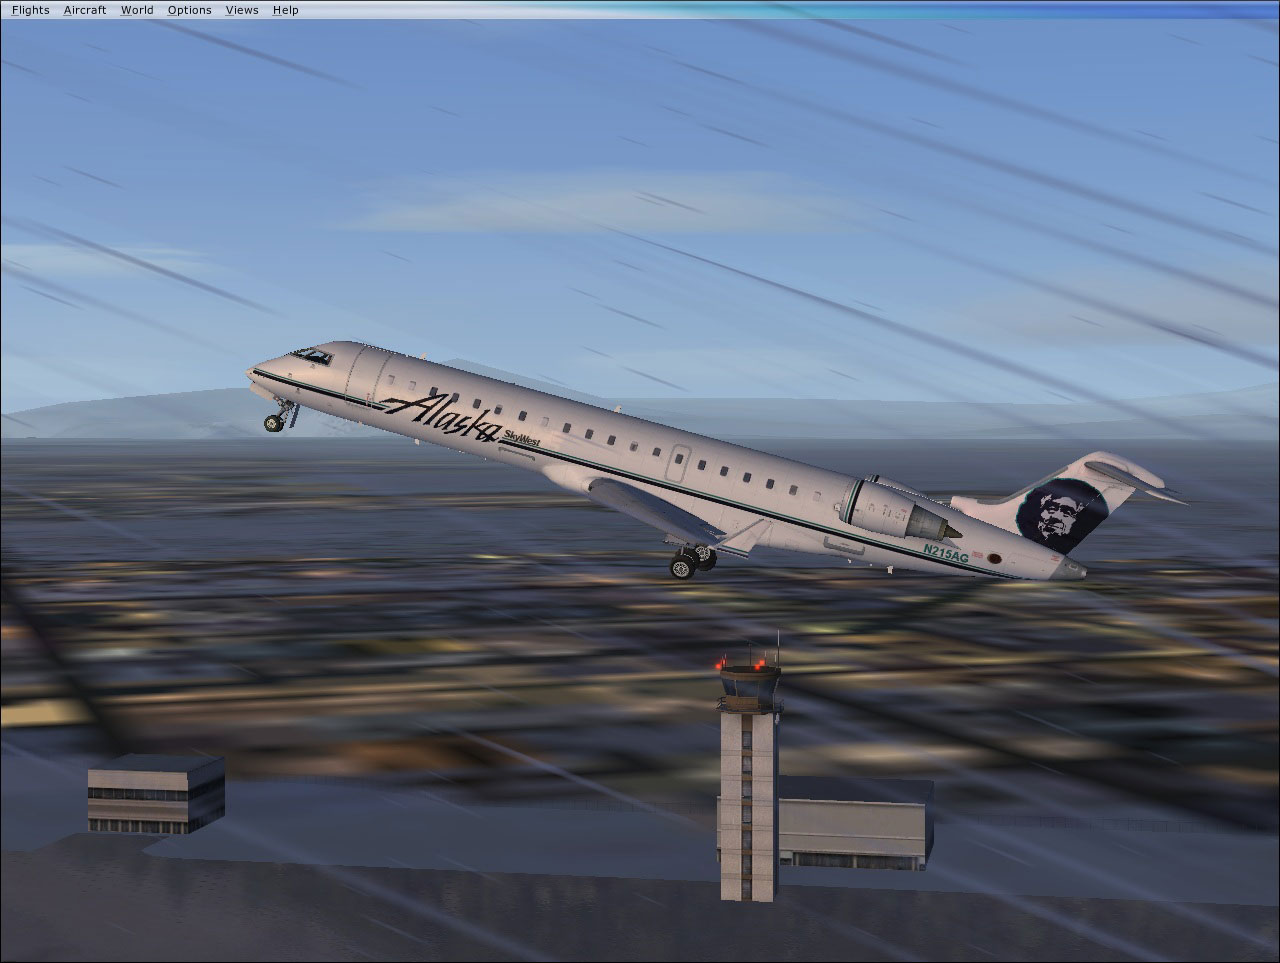 Alaska Skywest Airlines Crj 700 On Runway  Short News Poster